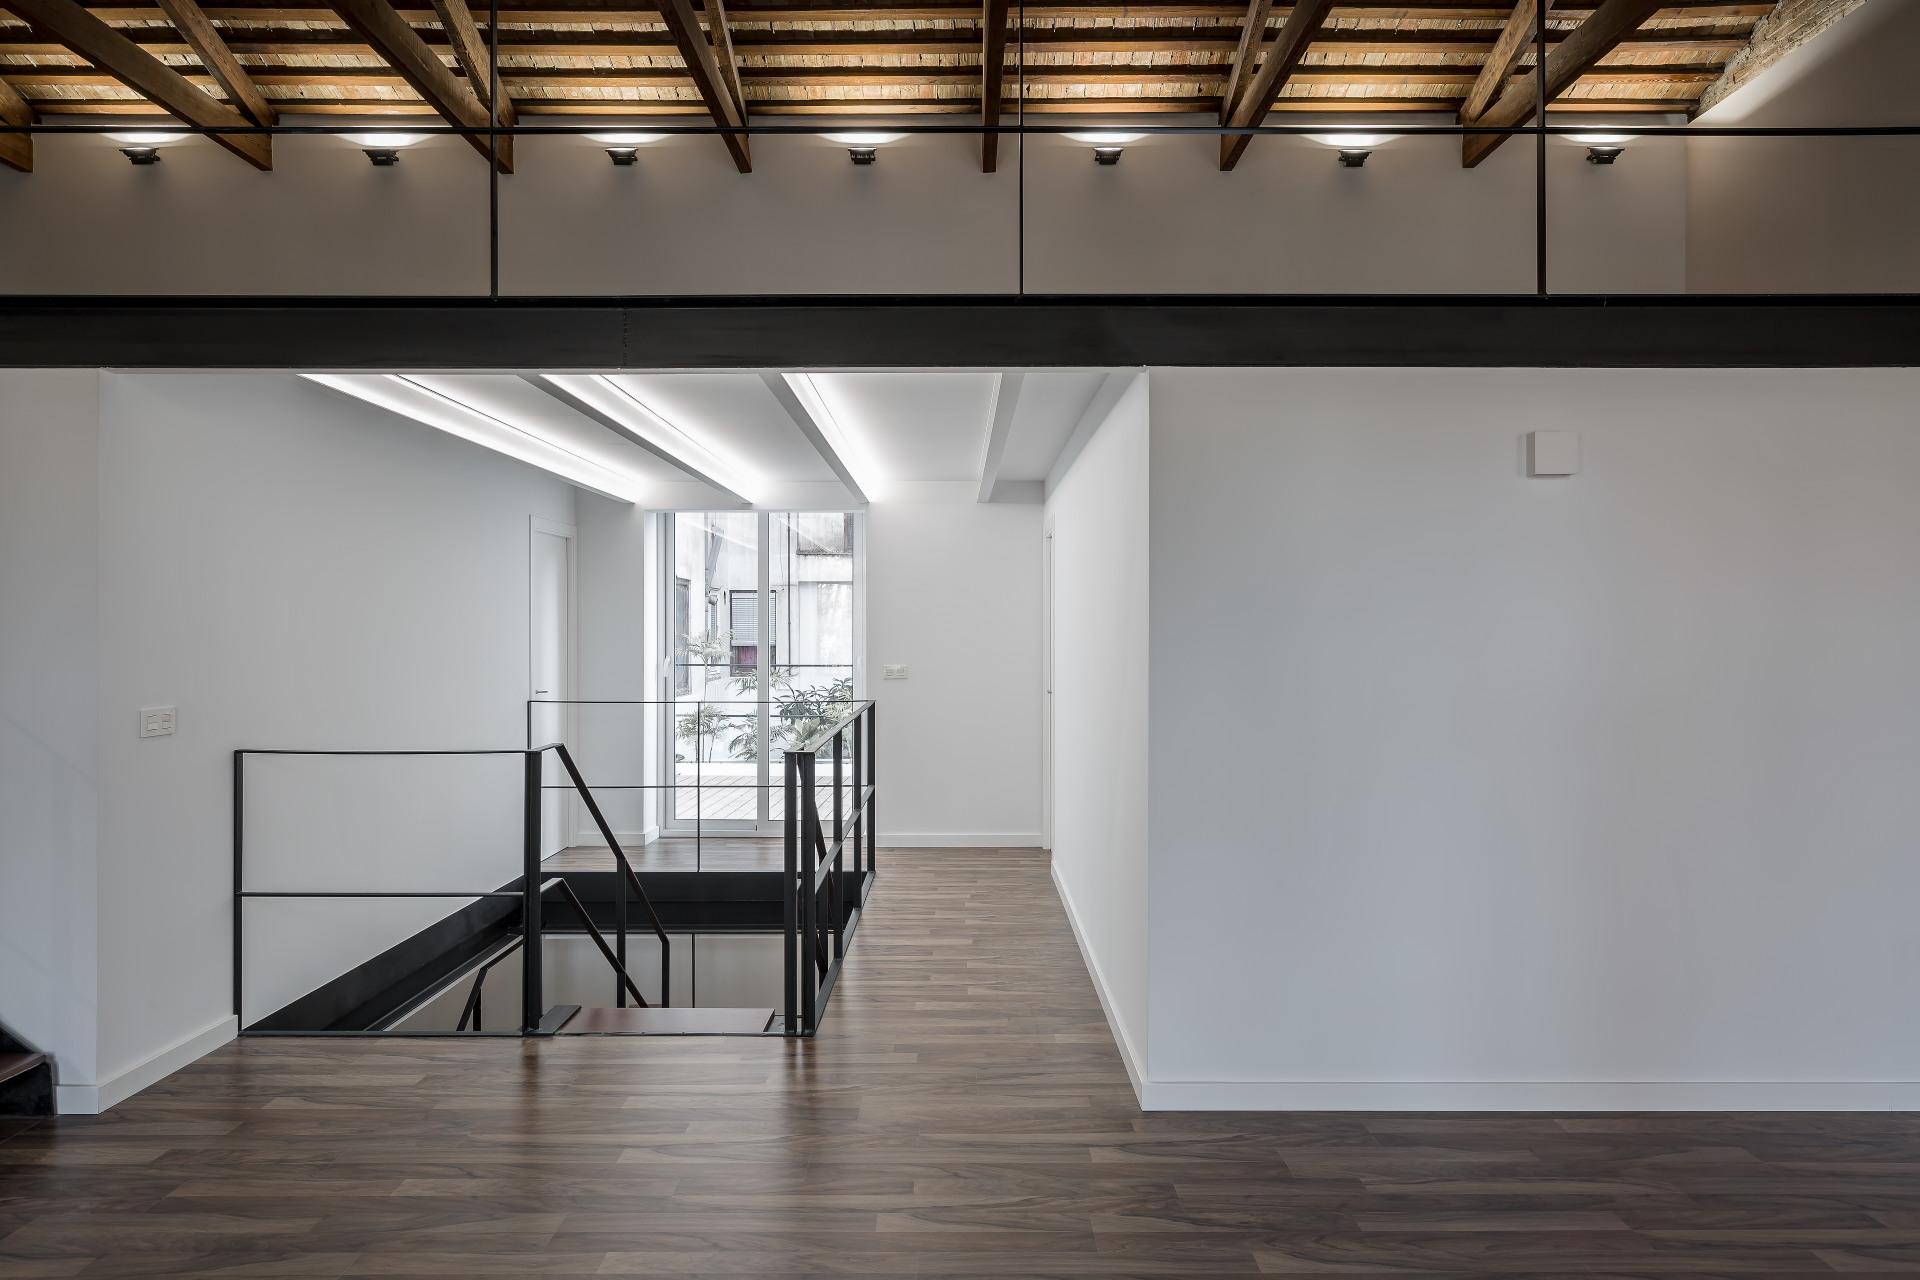 fotografia-arquitectura-valencia-german-cabo-viraje-rehabilitacion-campanar (26)